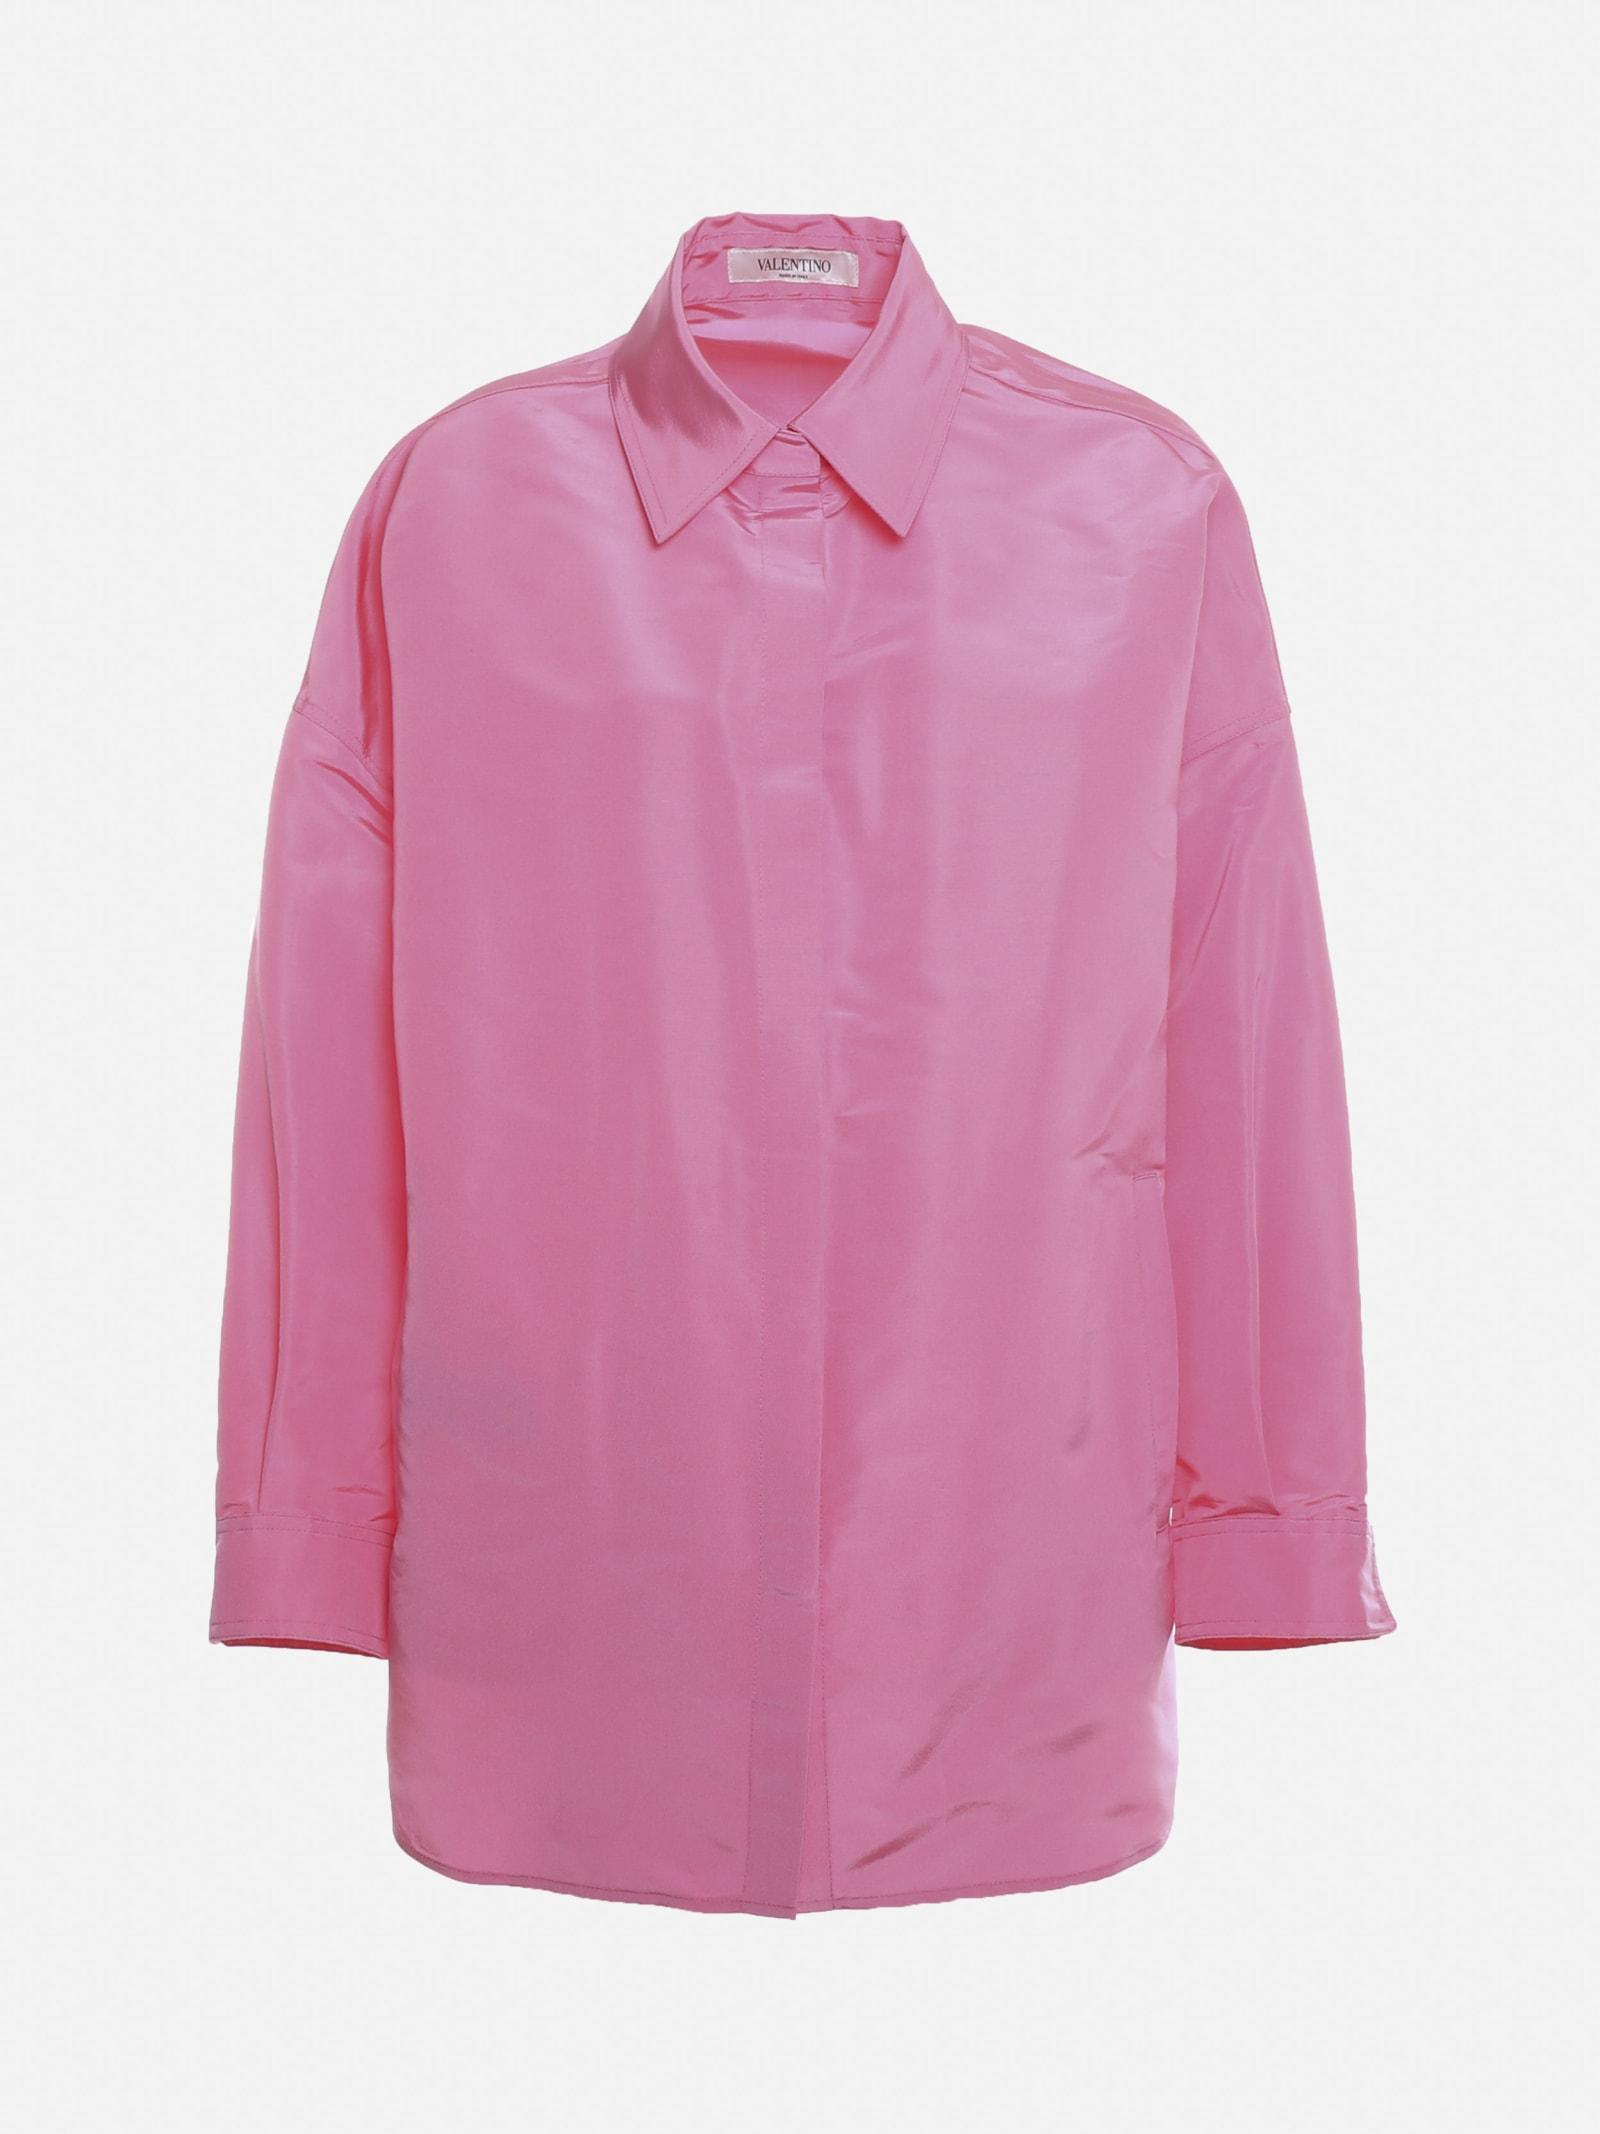 Valentino Jackets OVERSIZED SHIRT MADE OF SILK